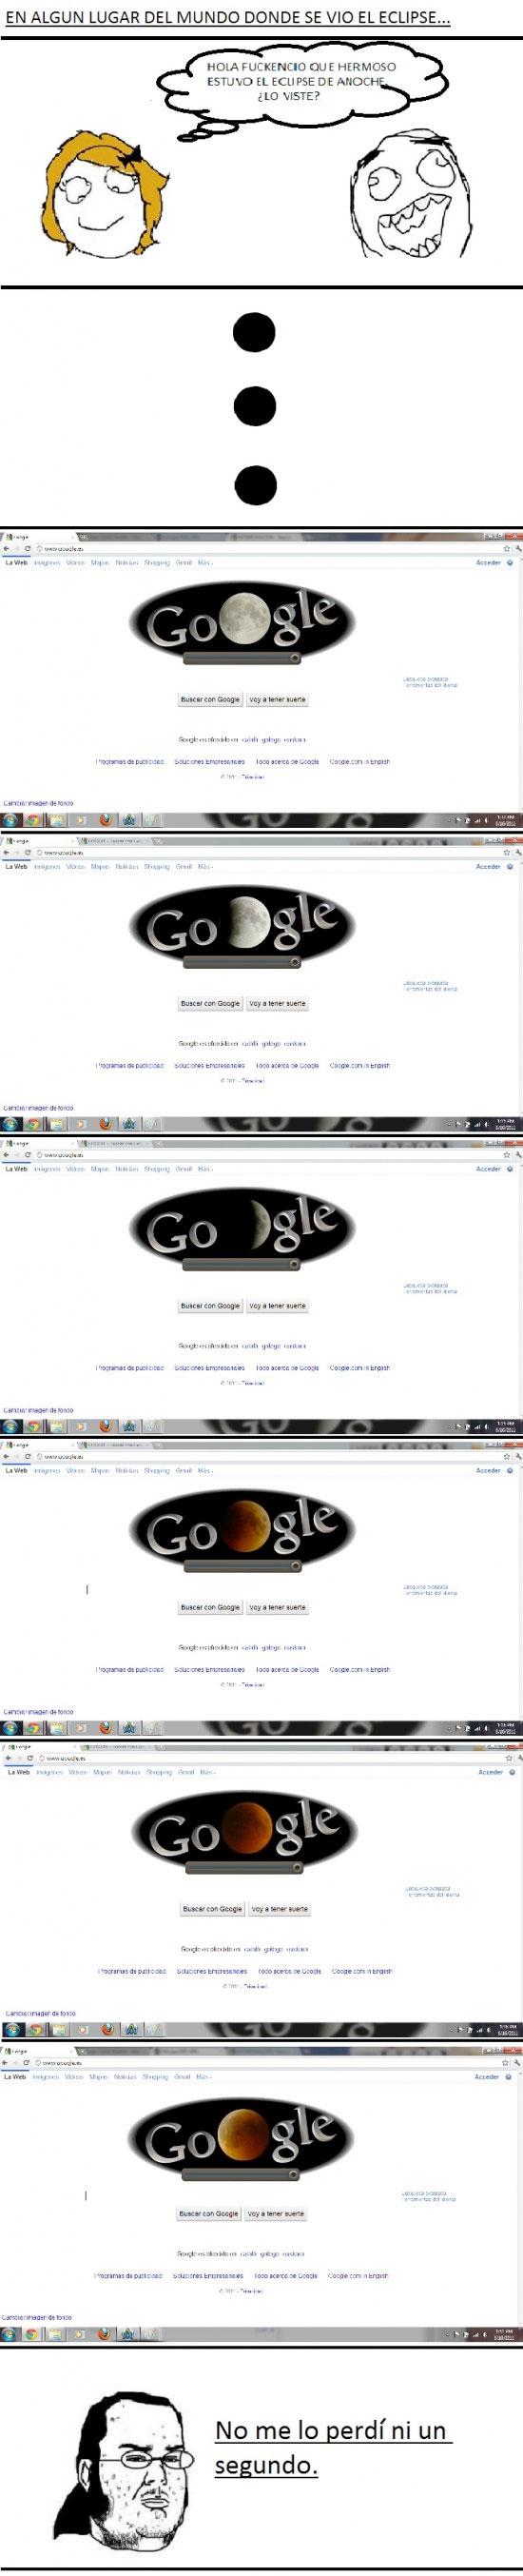 Friki - Eclipse lunar friki